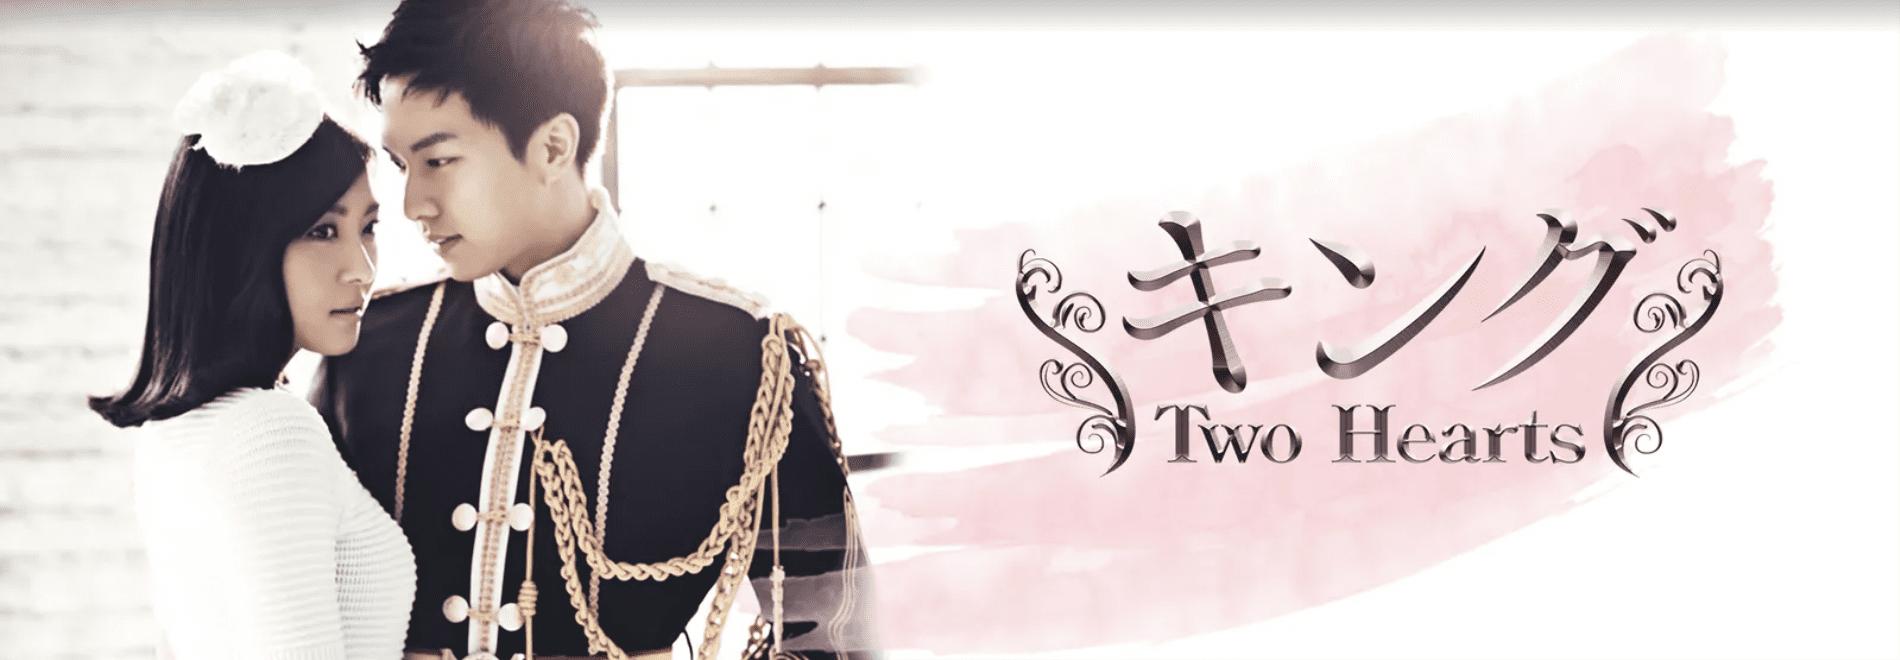 【Huluおすすめ韓国ドラマ】Hulu(フールー)のおすすめ韓国ドラマ作品一覧|アイリス・いたずらなKiss・グッドドクターなど多数配信中!|人気作品:キング ~Two Hearts